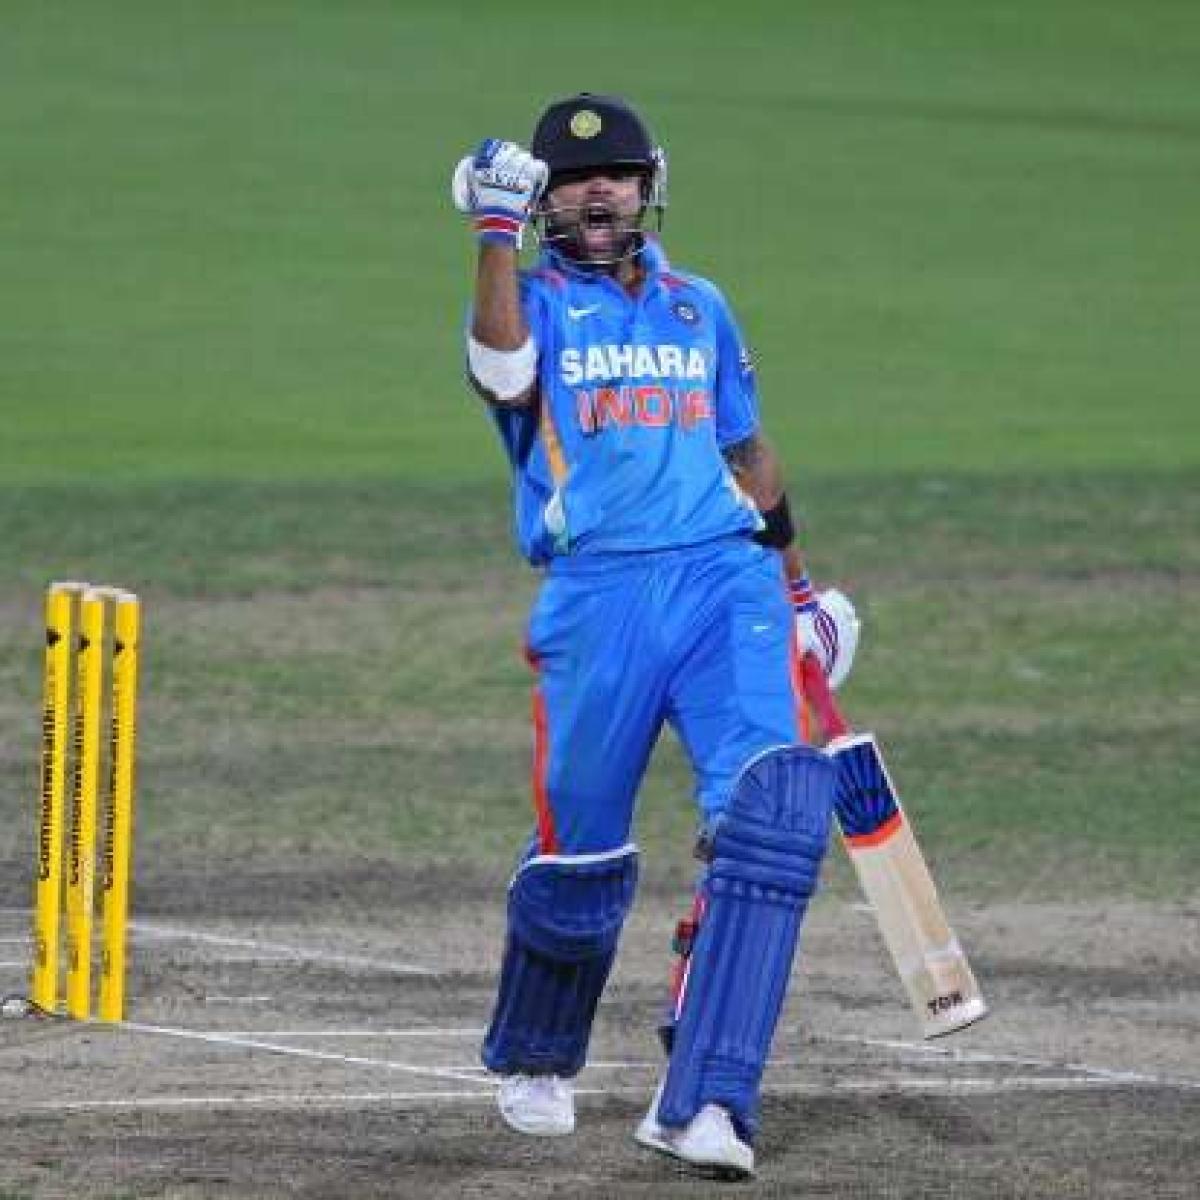 This day that year: Virat Kohli's brilliant innings in India's quickest ODI chase of 320 against Sri Lanka